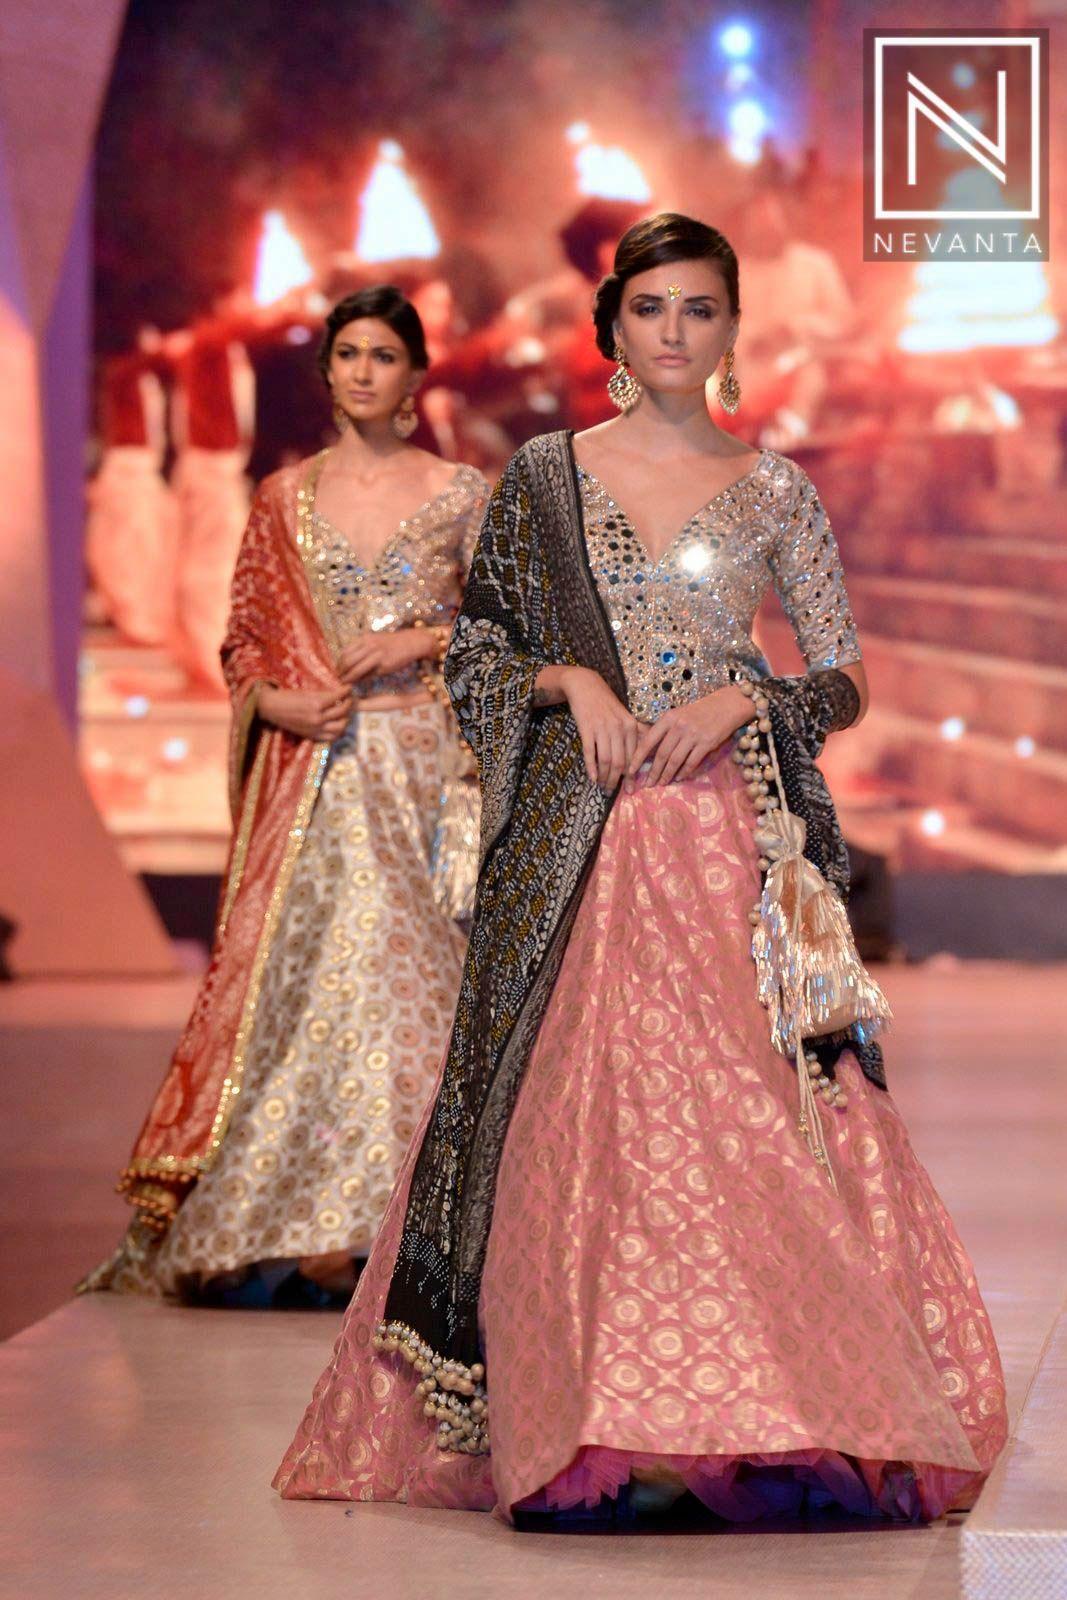 Look - Malhotra Manish bridal lehanga 14 collection video